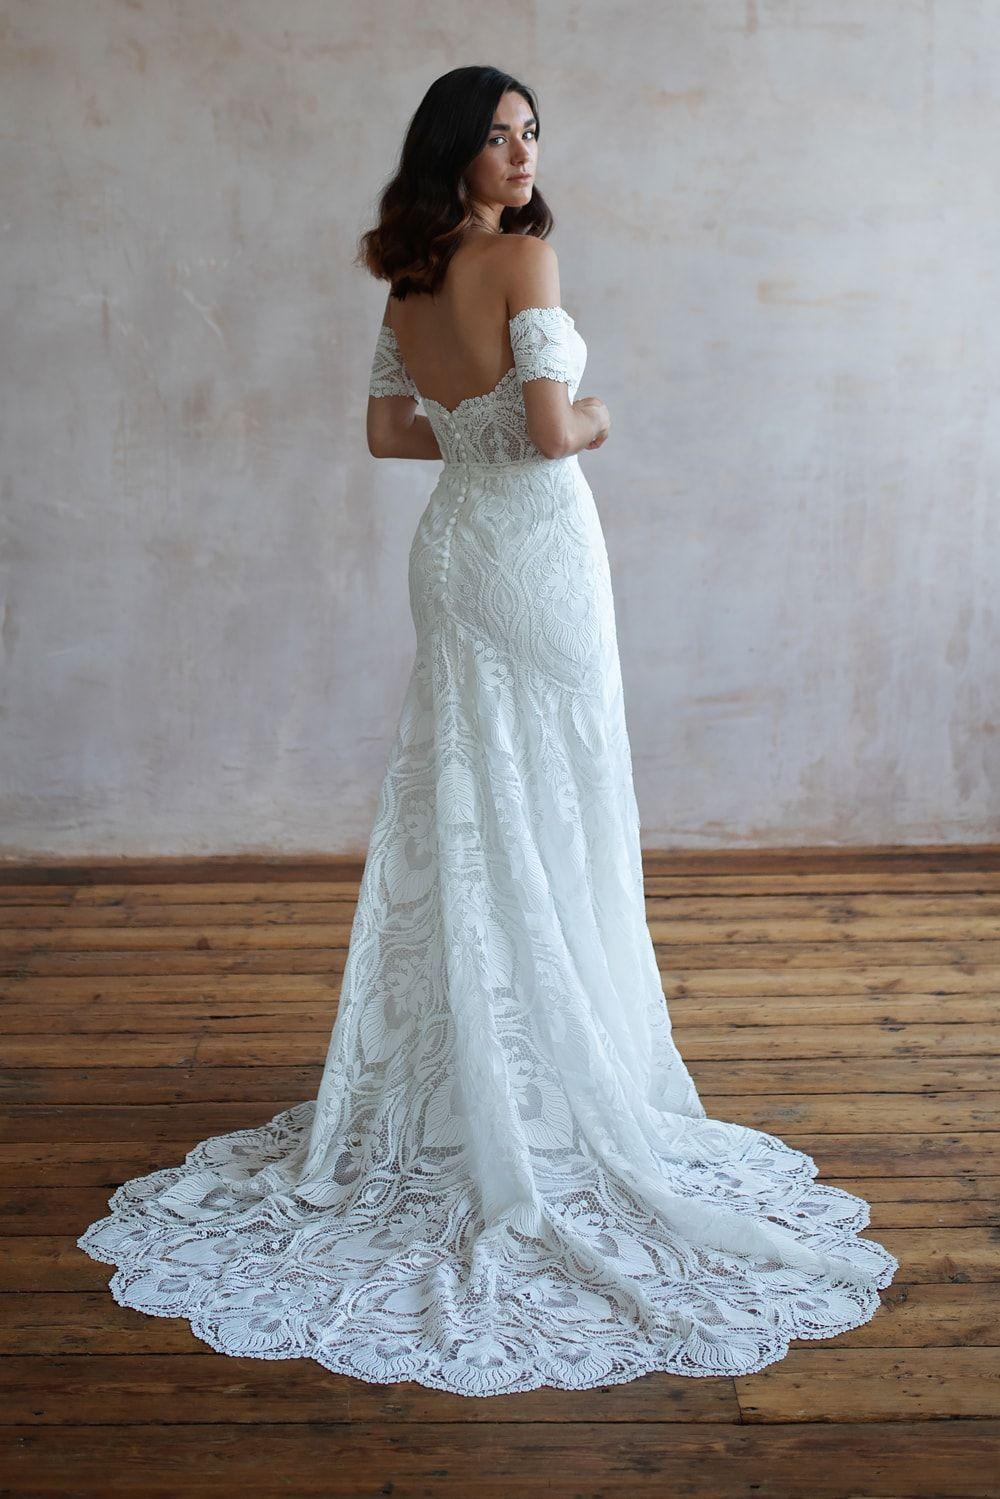 Boho Wedding Dress Bridal Shops Near Me Bridal Shops London Wedding Dresses Lace Lace Wedding Dresses Wedding Dress Lace Lace Wedding Dress 20 7